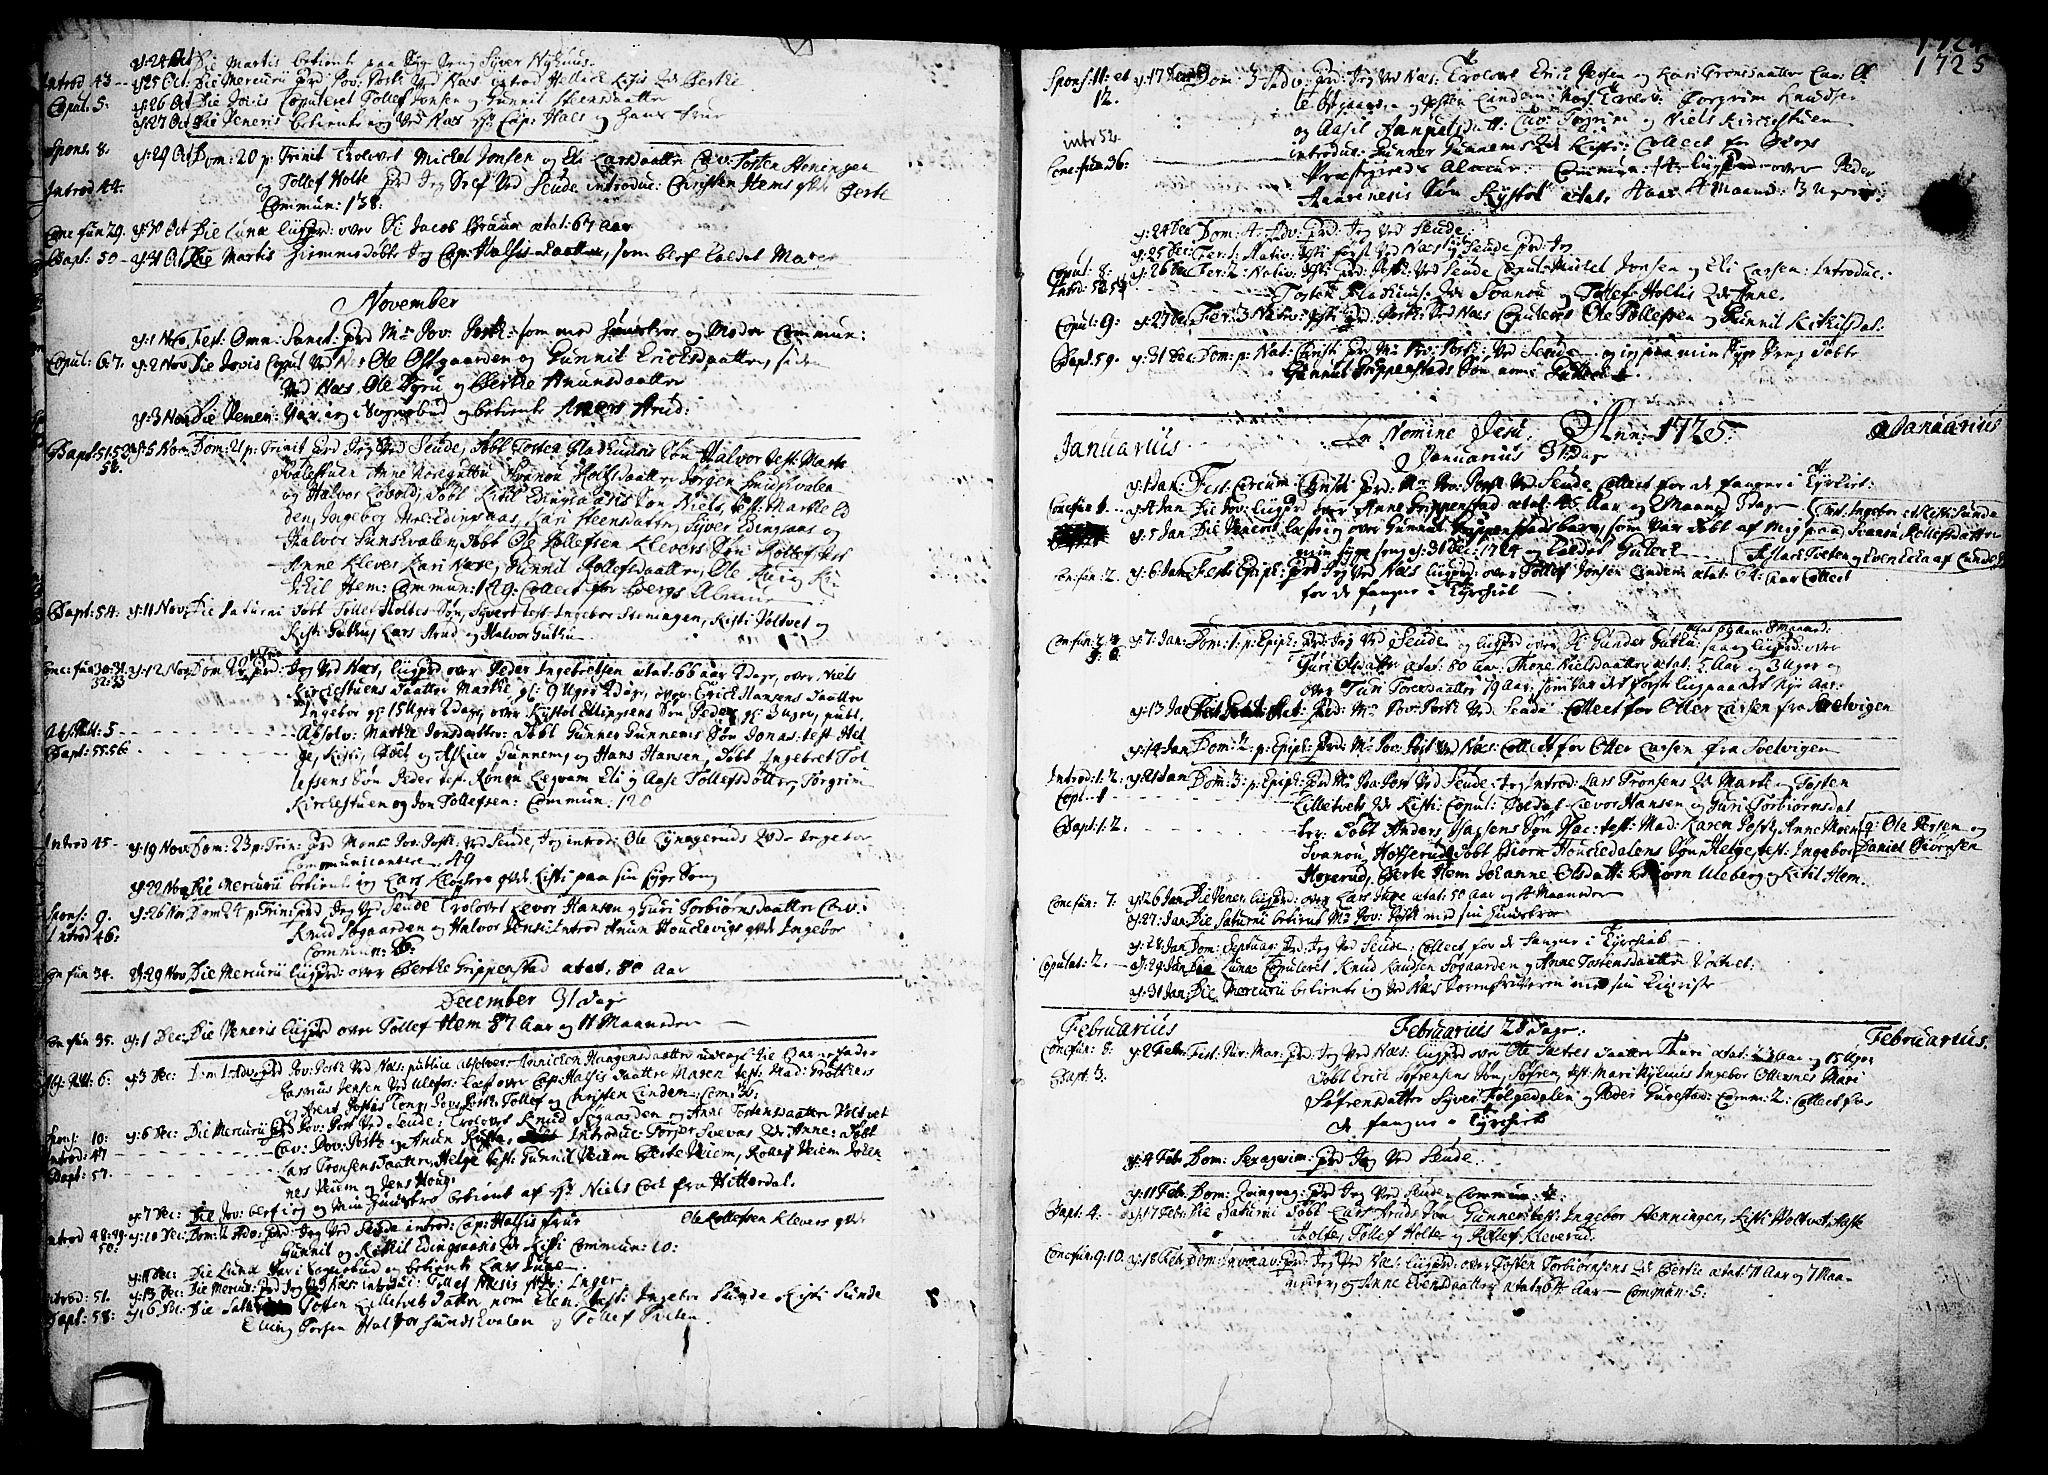 SAKO, Sauherad kirkebøker, F/Fa/L0003: Ministerialbok nr. I 3, 1722-1766